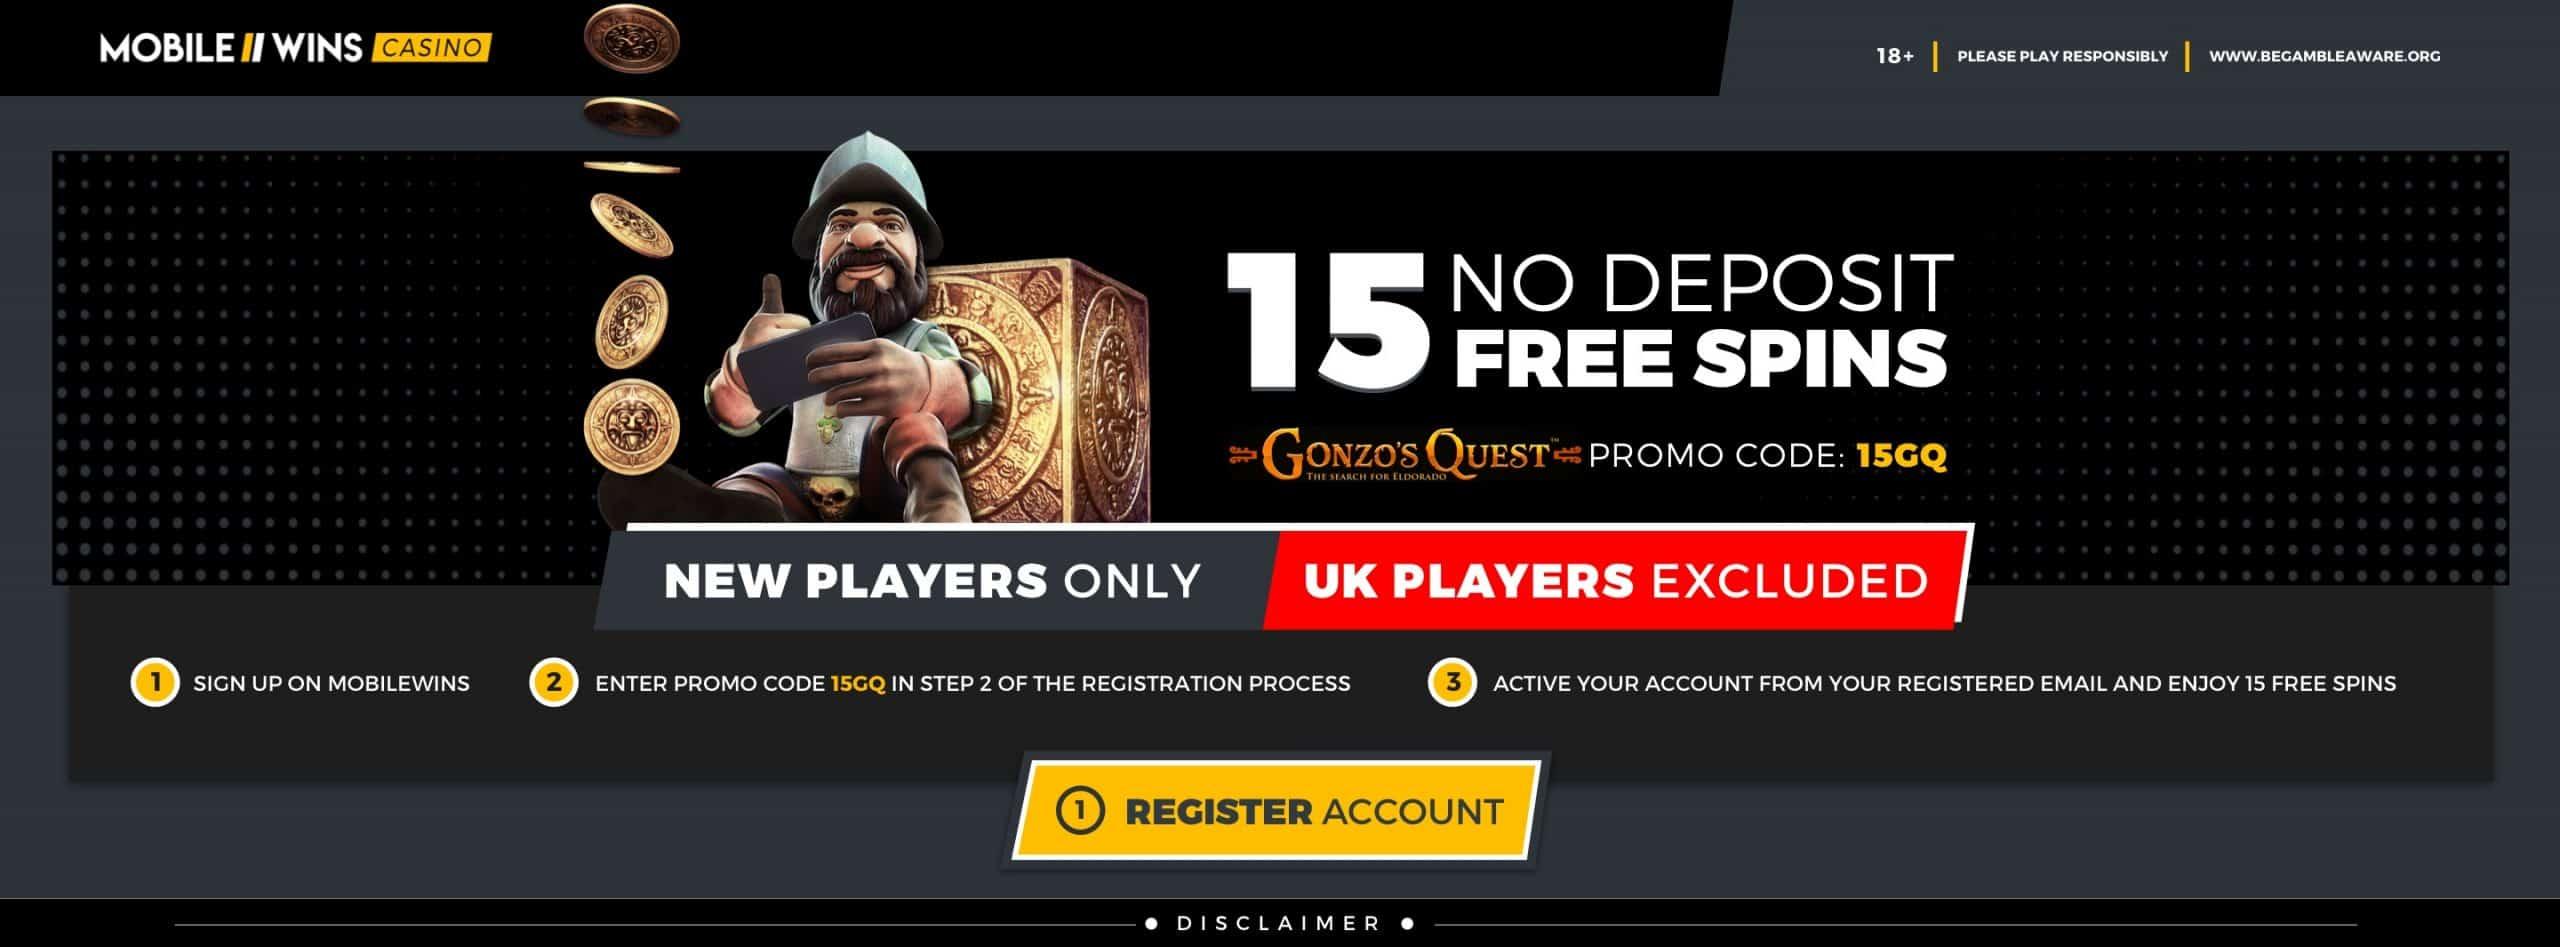 Promotion 15 No Deposit Free Spins